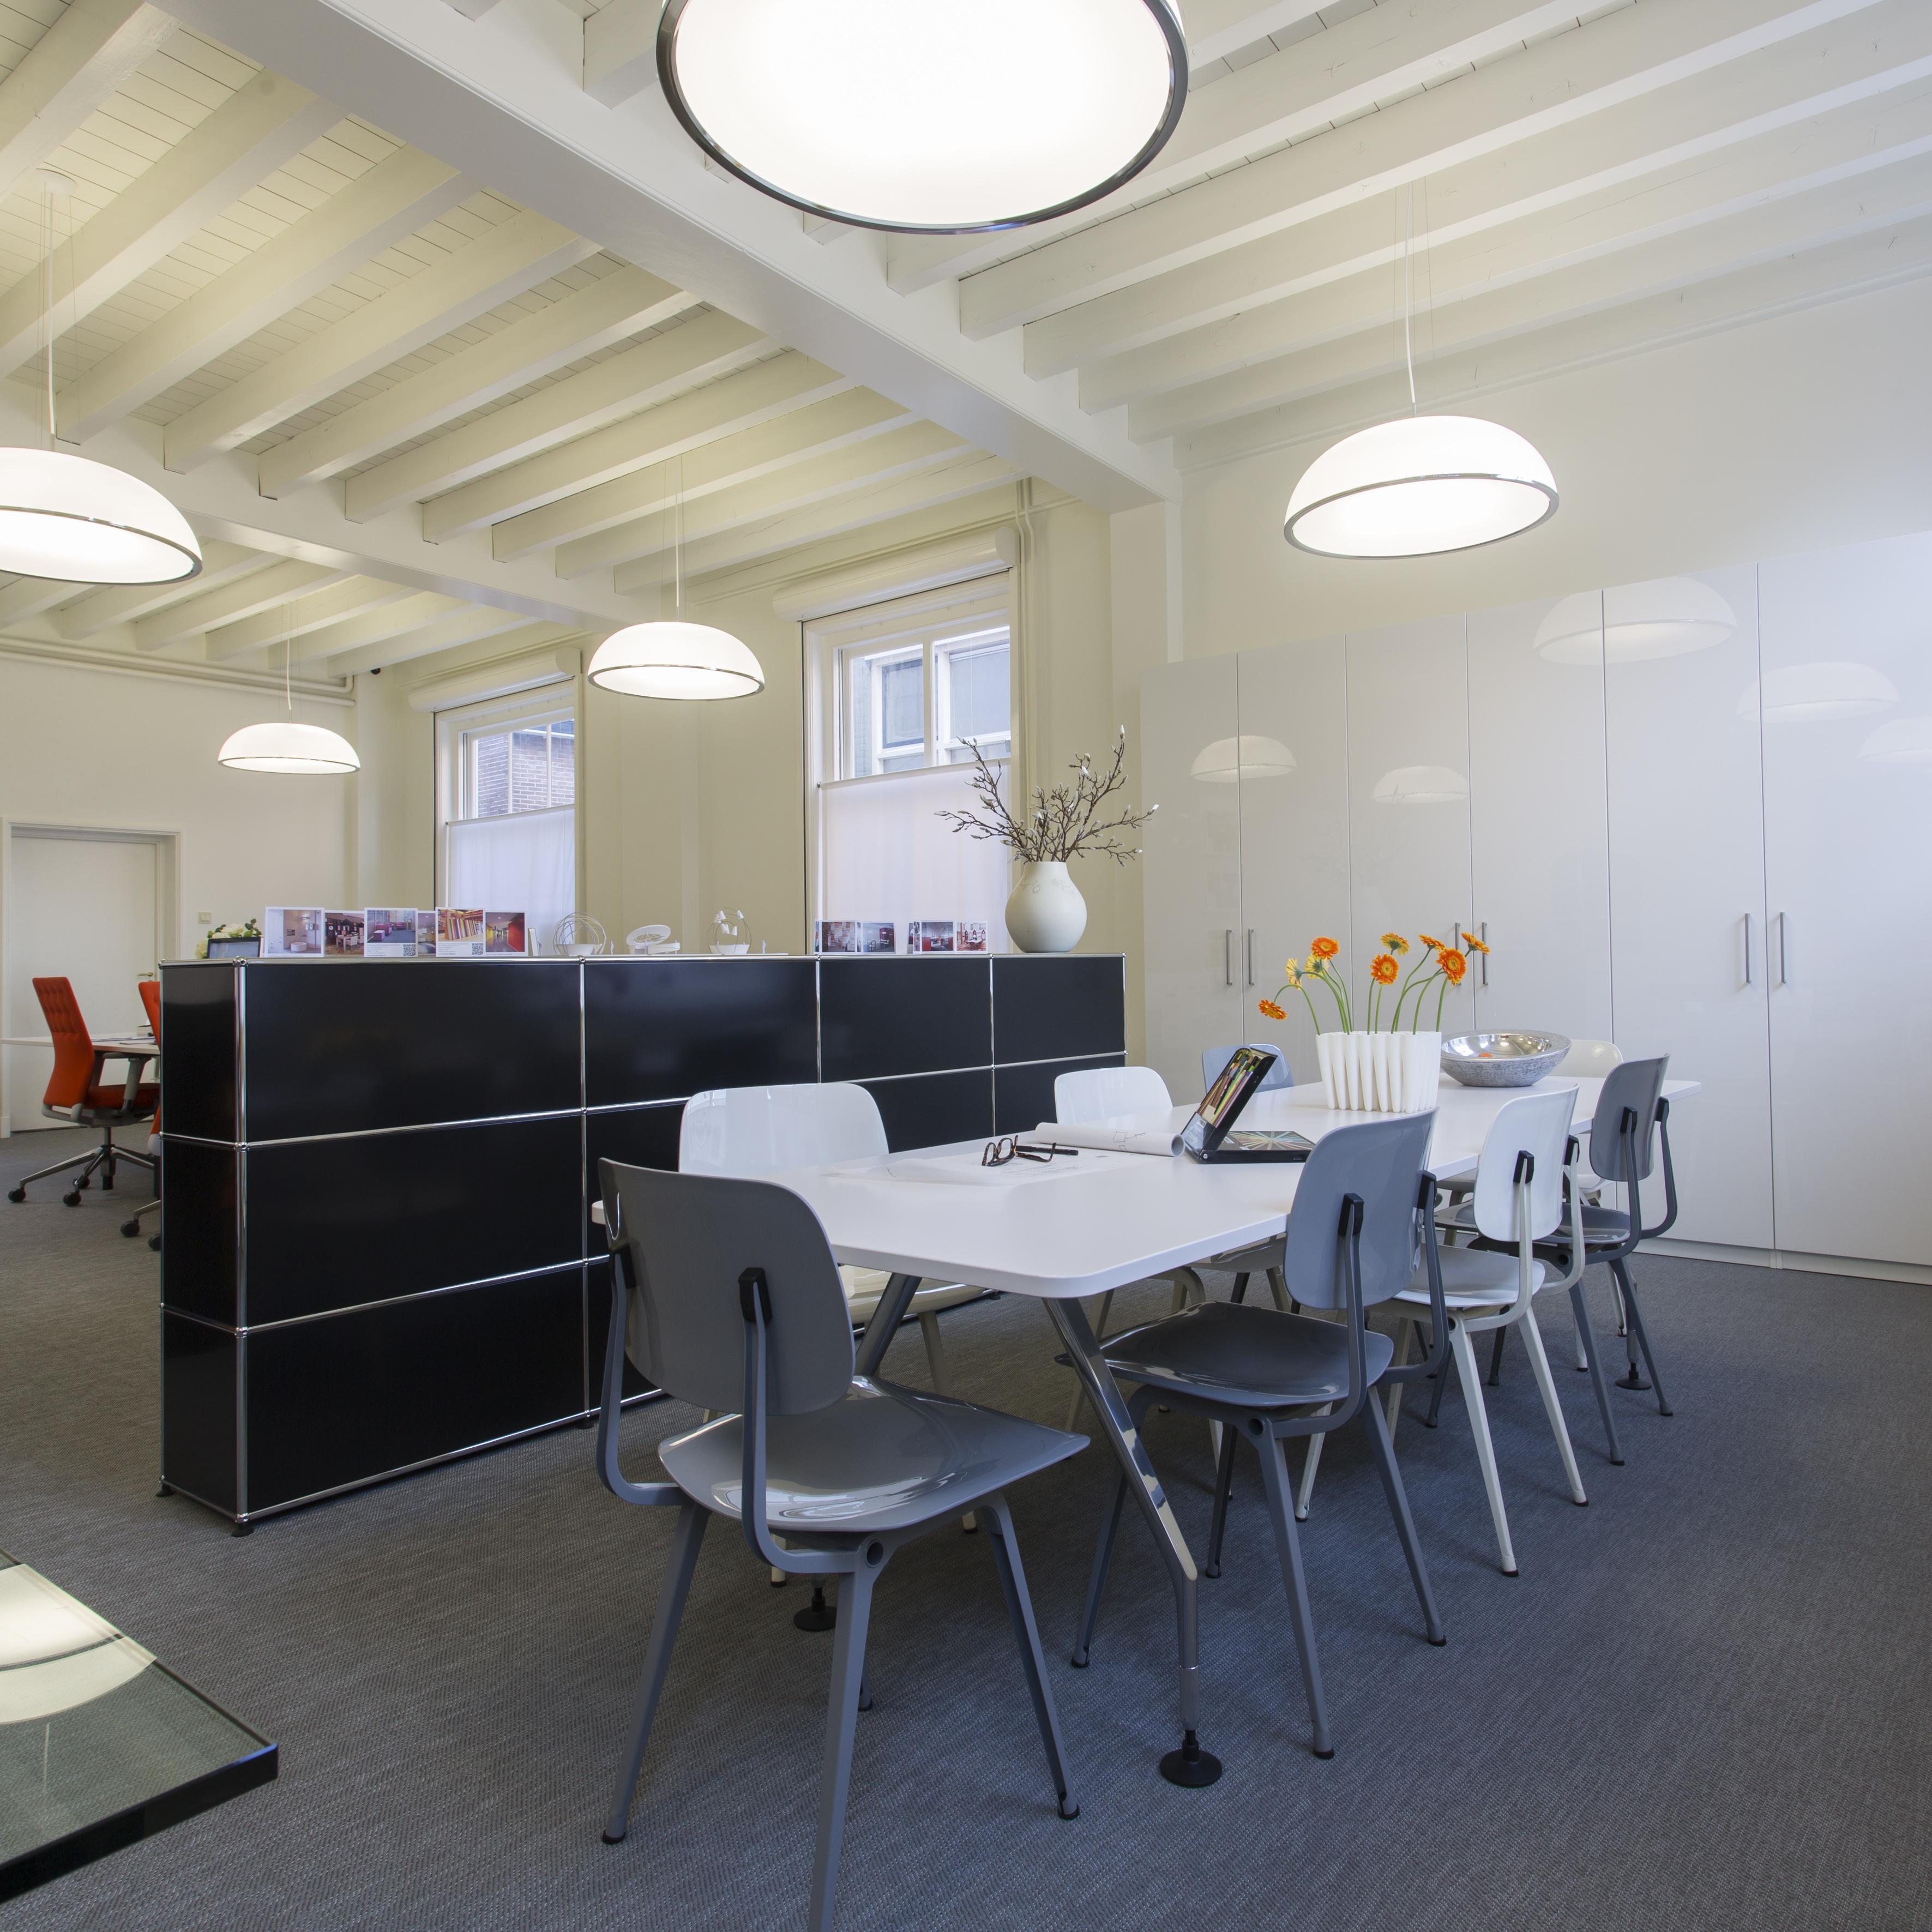 Vacatures — Annekoos Littel Interieurarchitecten